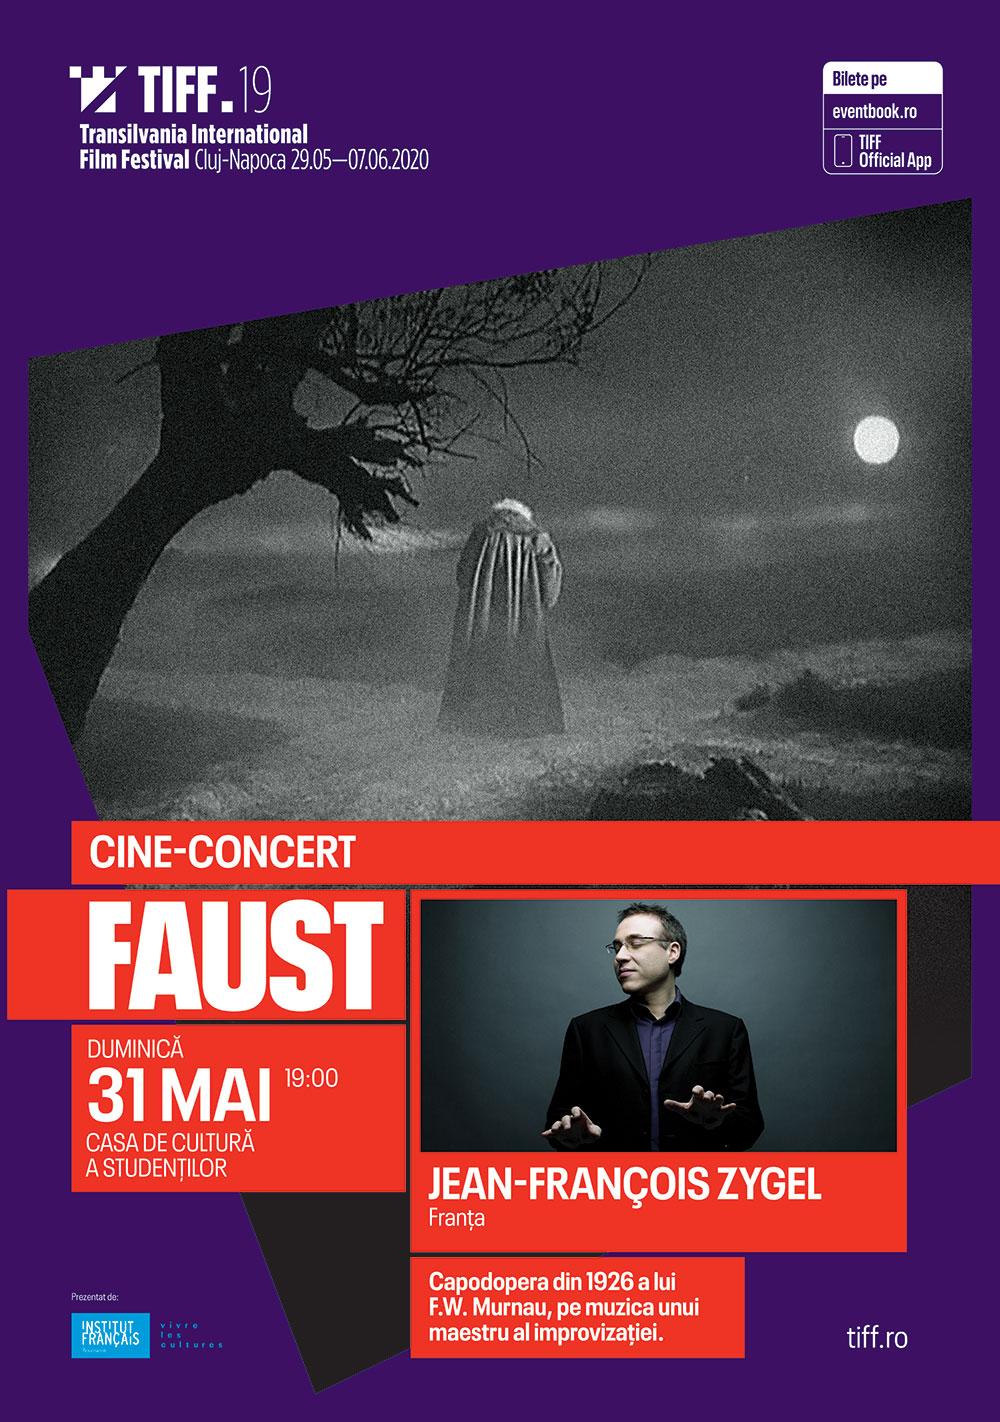 Cine-concerte de excepție la TIFF 2020: Faust și  Malombra